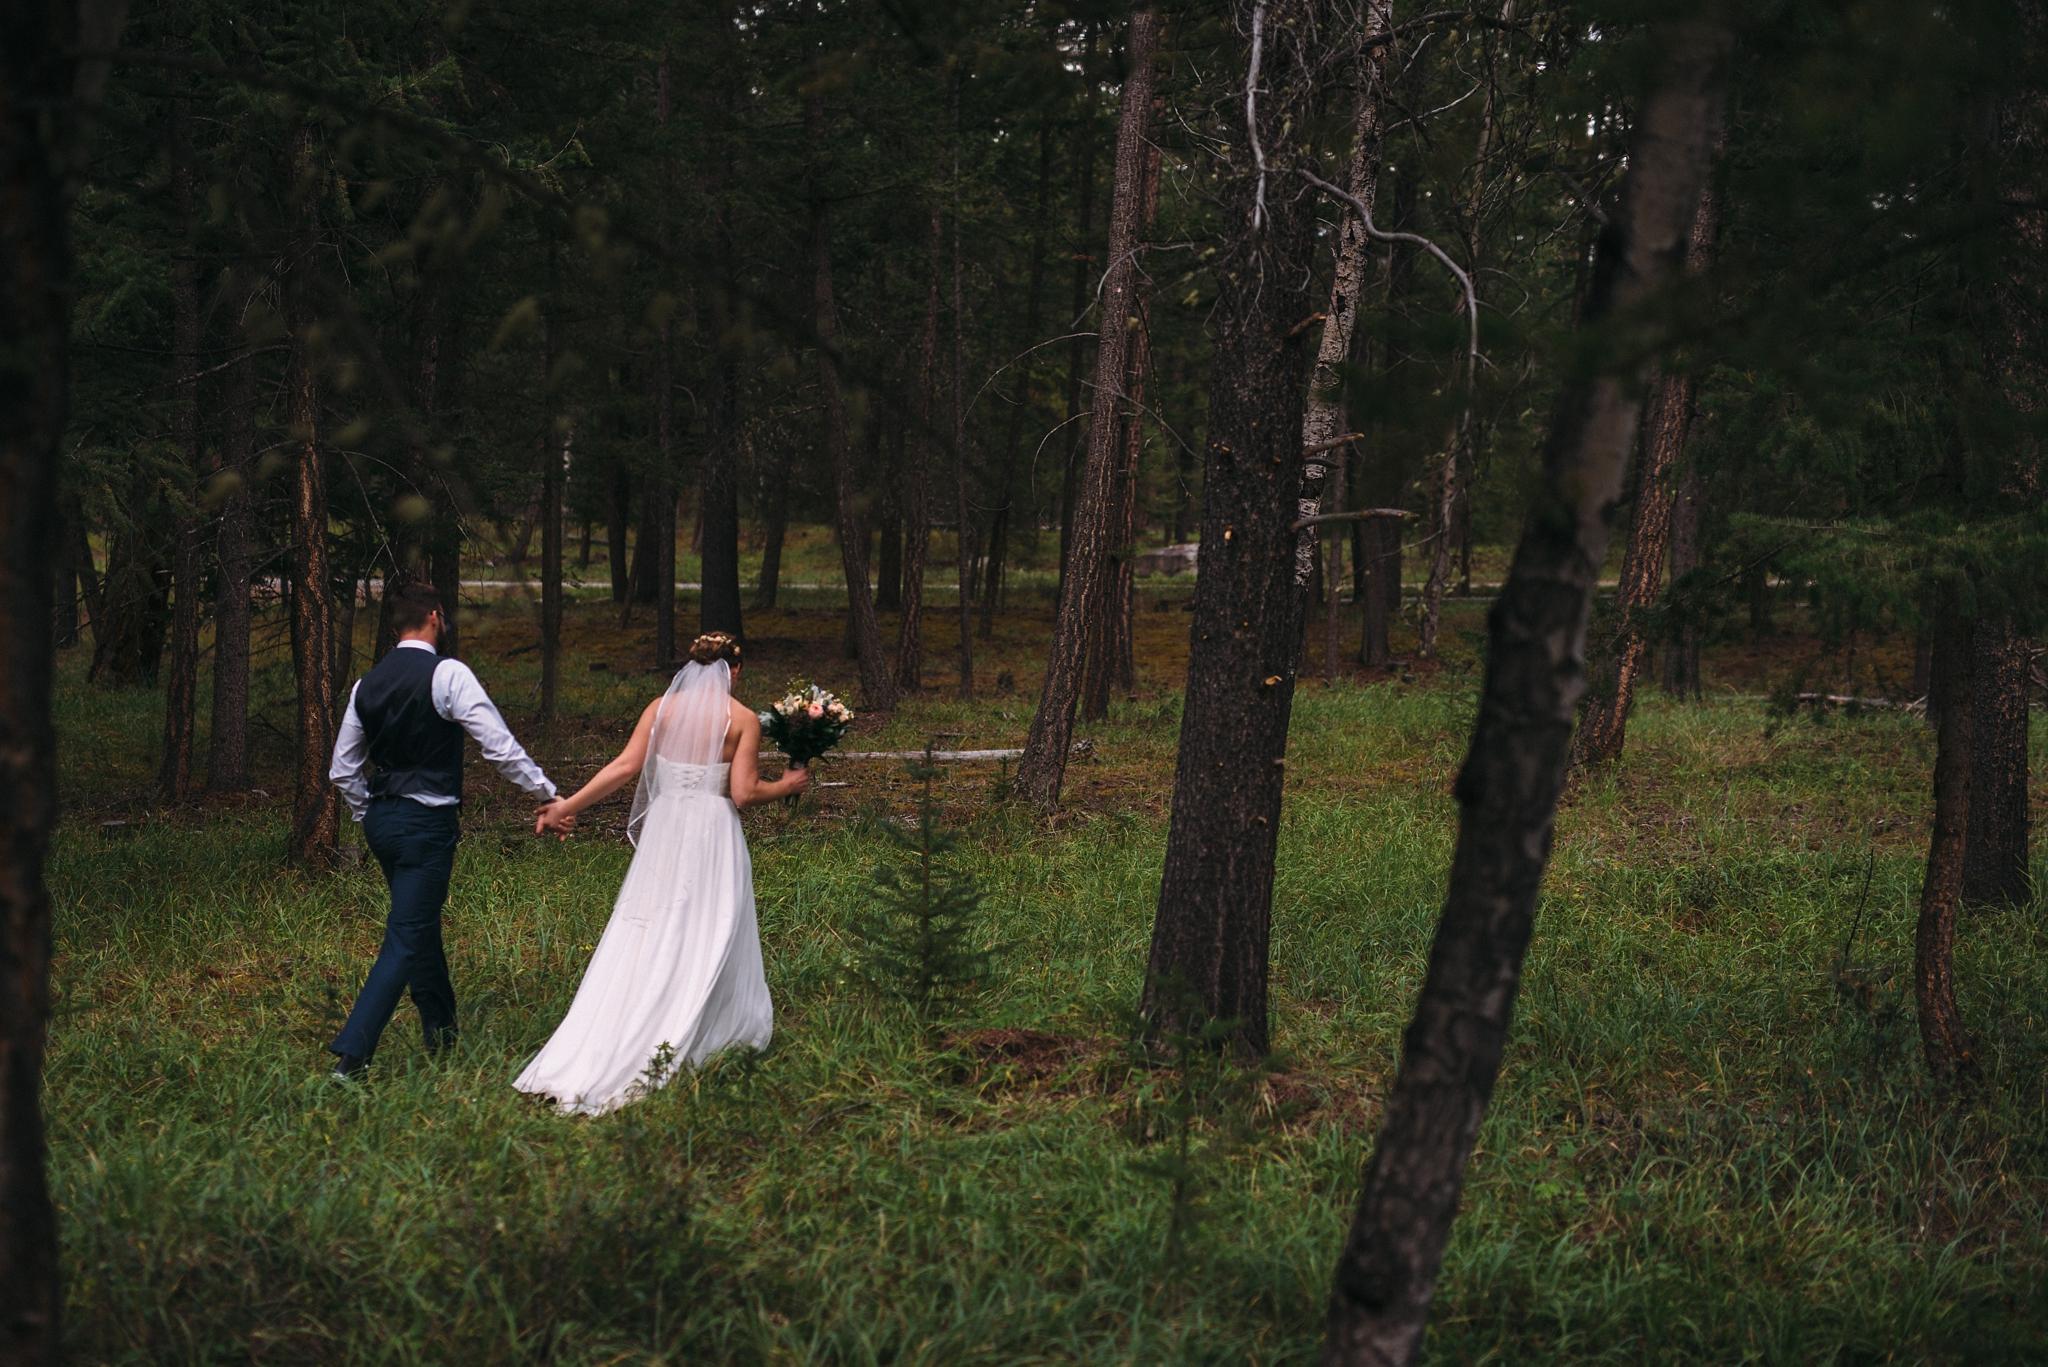 kaihla_tonai_intimate_wedding_elopement_photographer_2546